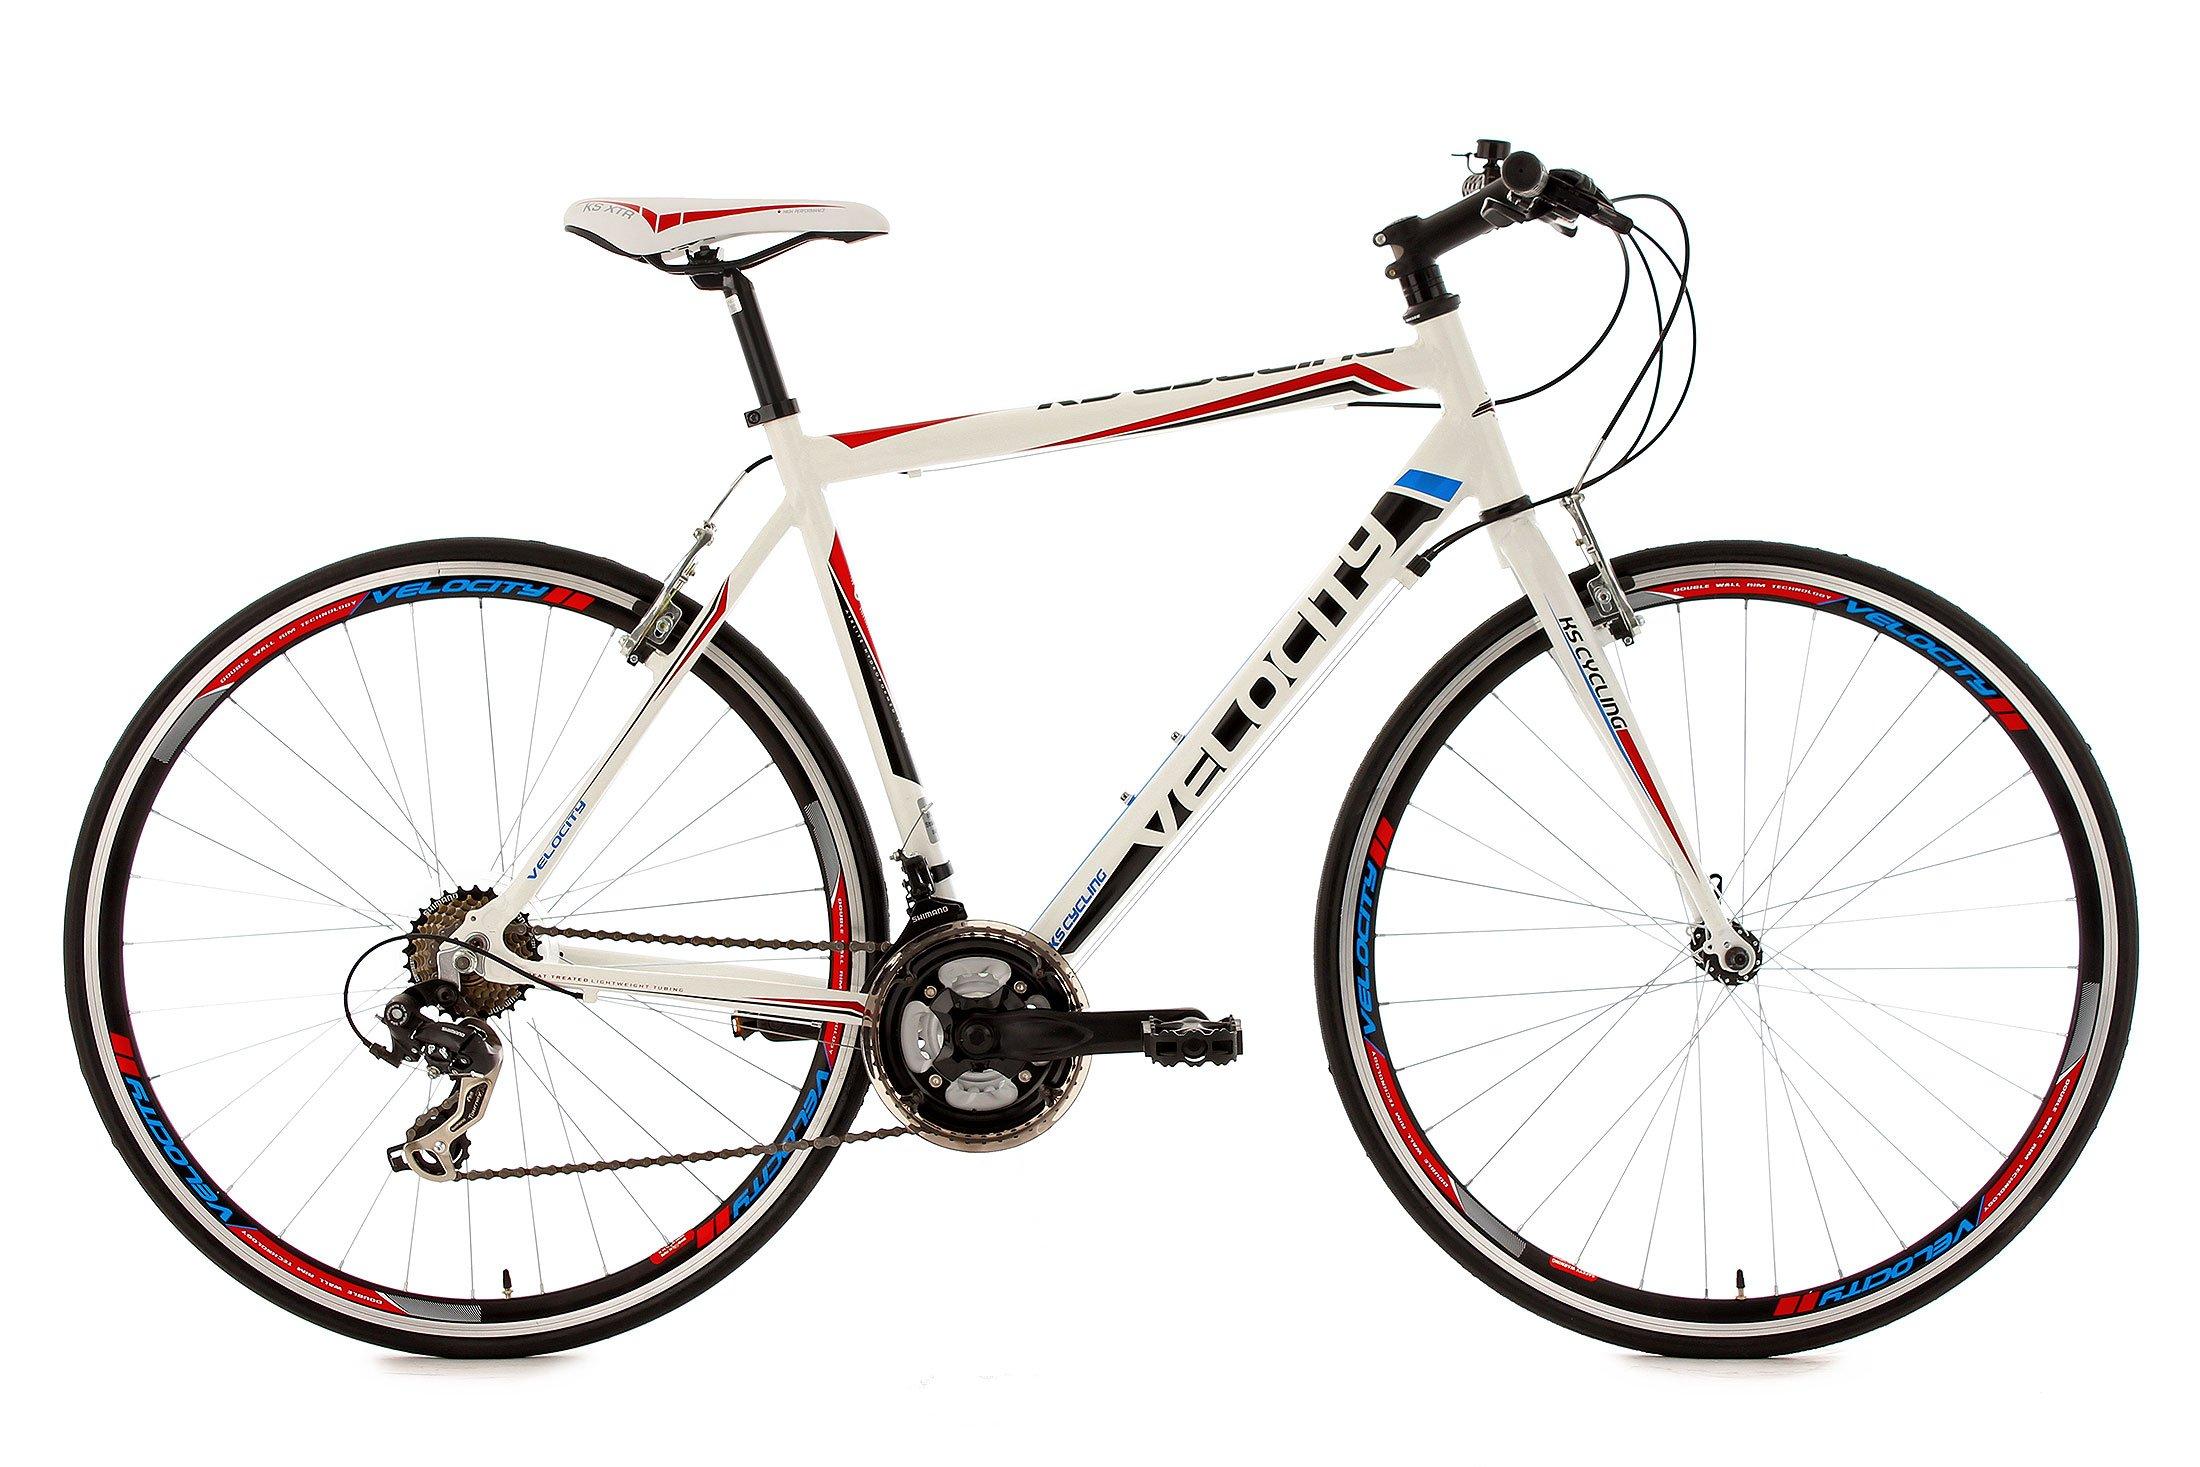 KS Cycling Uni Fahrrad Fitnessbike Alu-rahmen 28 Zoll Velocity 21-gänge RH 53 c